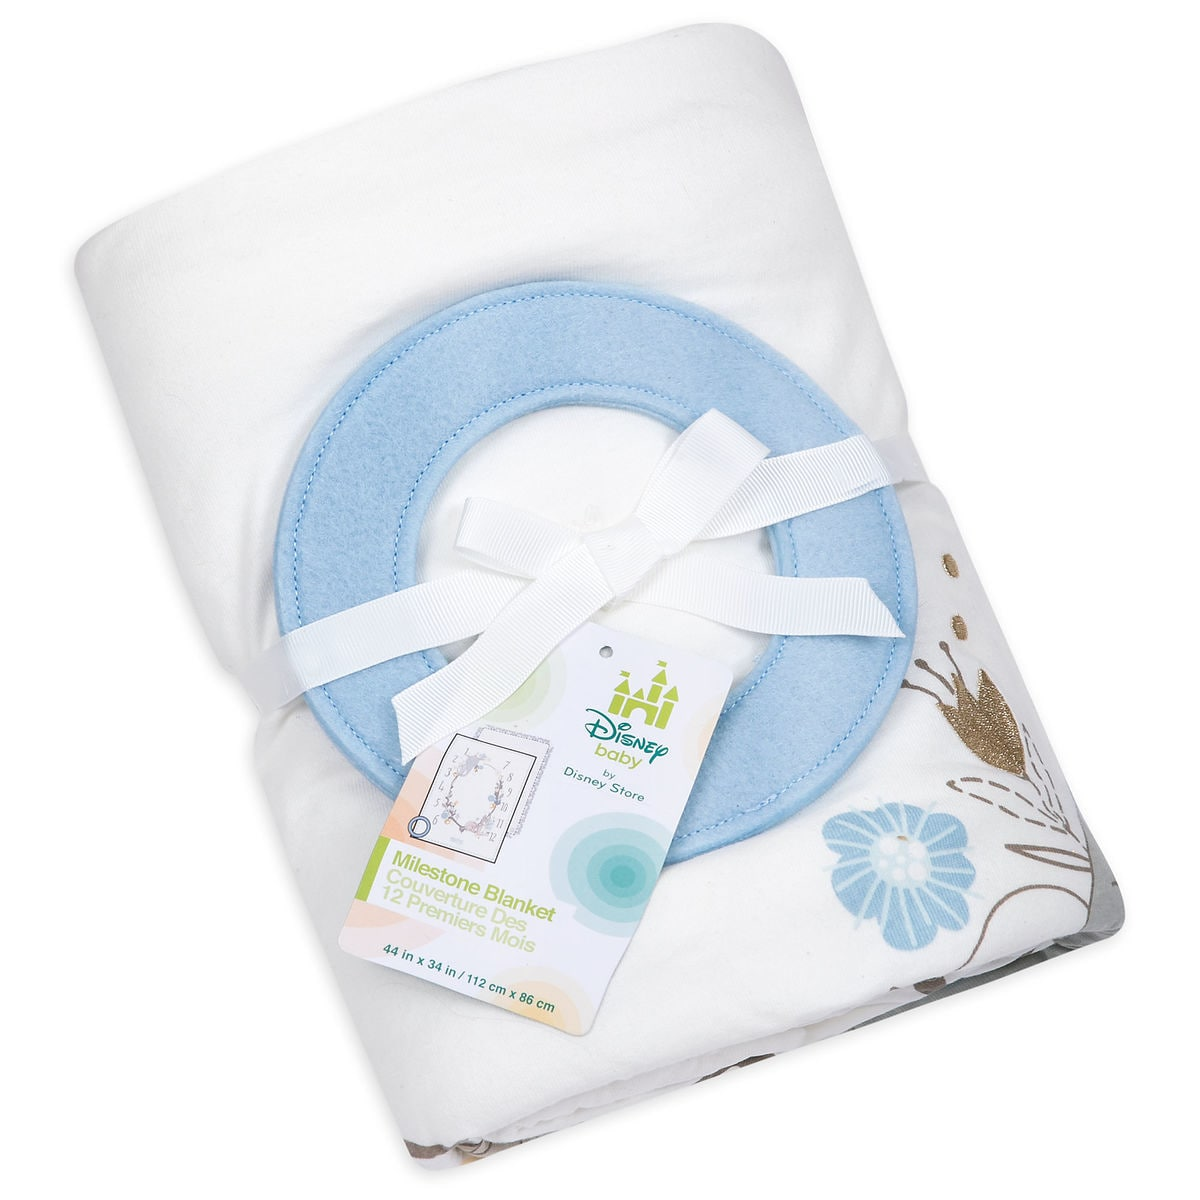 Disney Classics Milestone Blanket for Baby - Personalizable   shopDisney